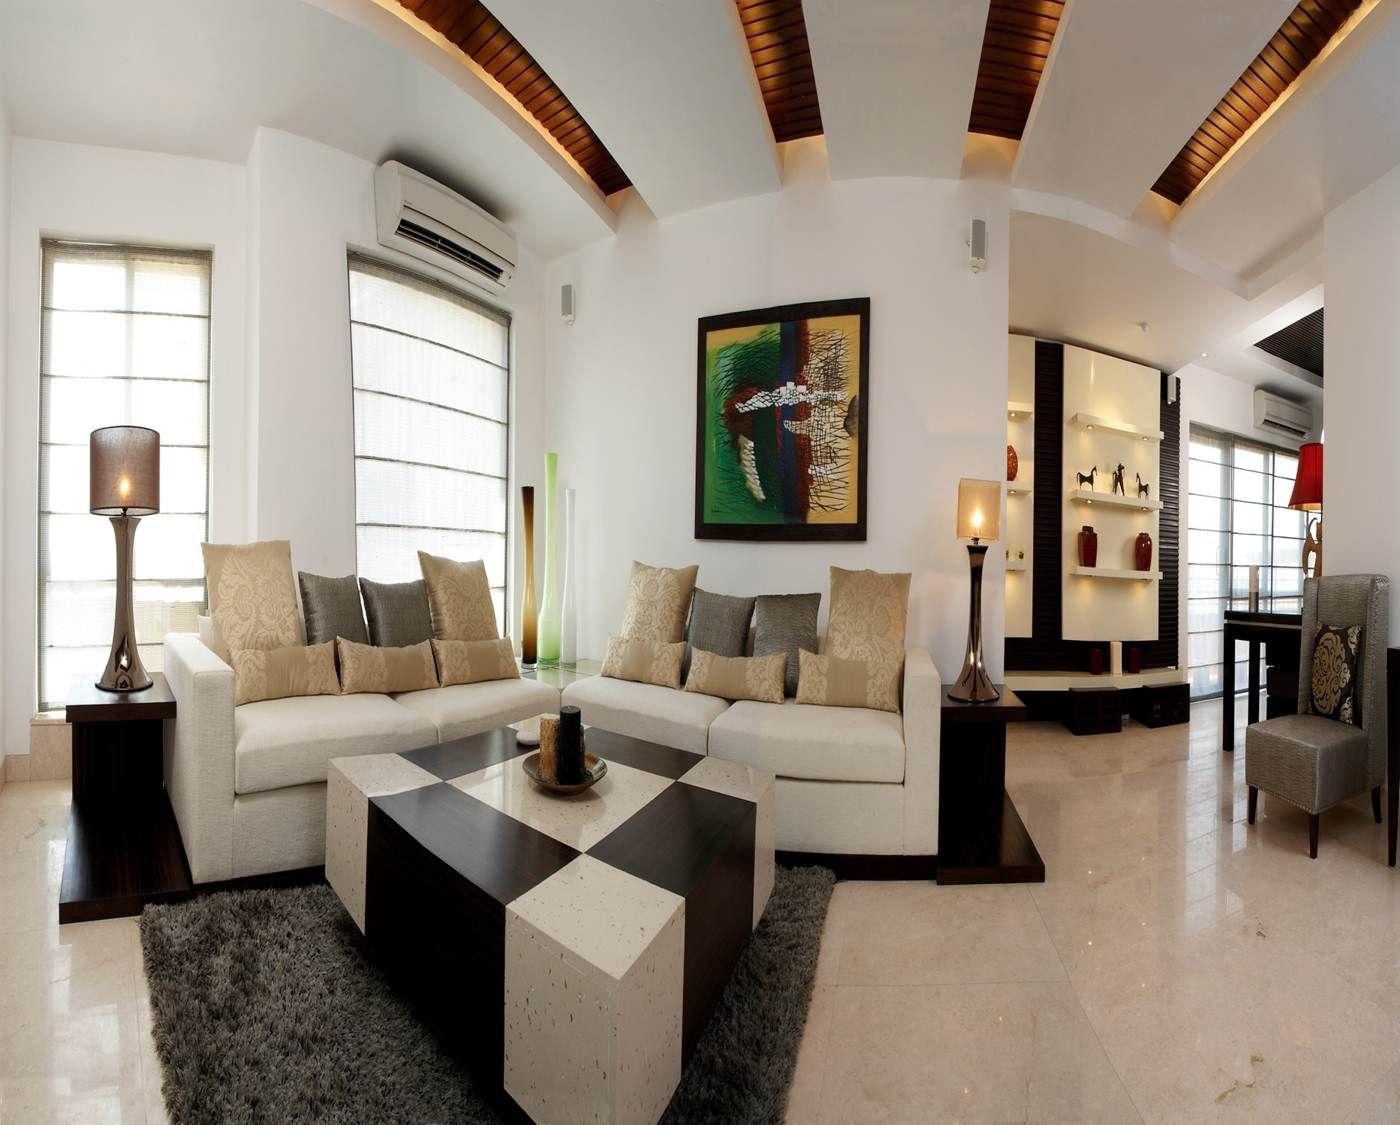 Interior Designing Services In Delhi Ncr By Experienced